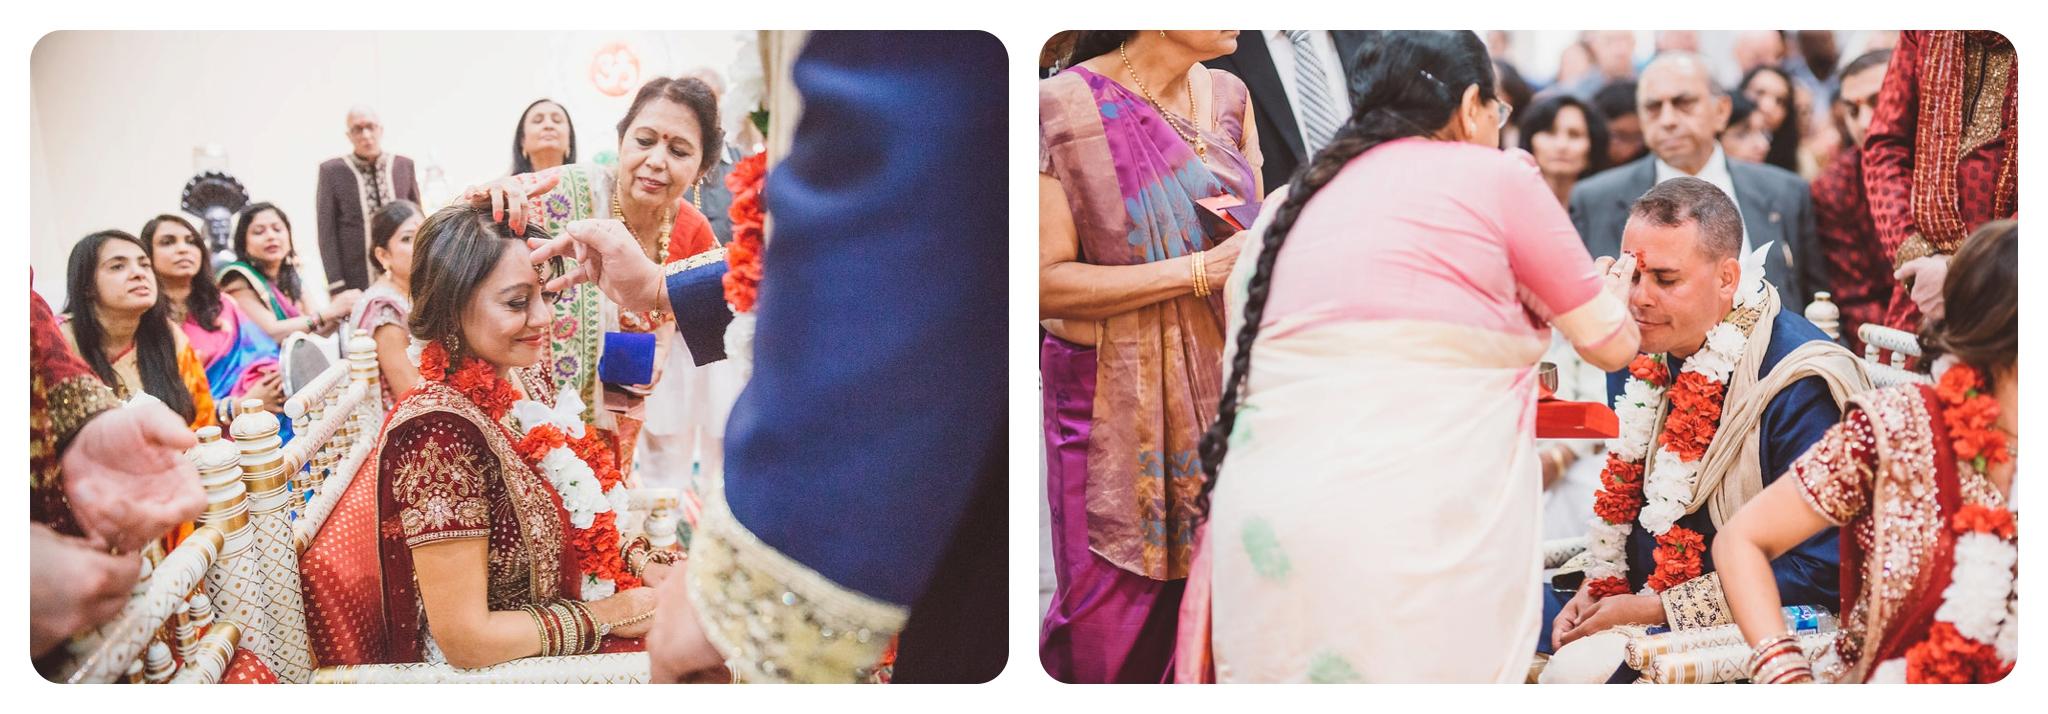 Virginia-Weddings-Center-in-the-Square-Pat-Cori-Photography-022.jpg